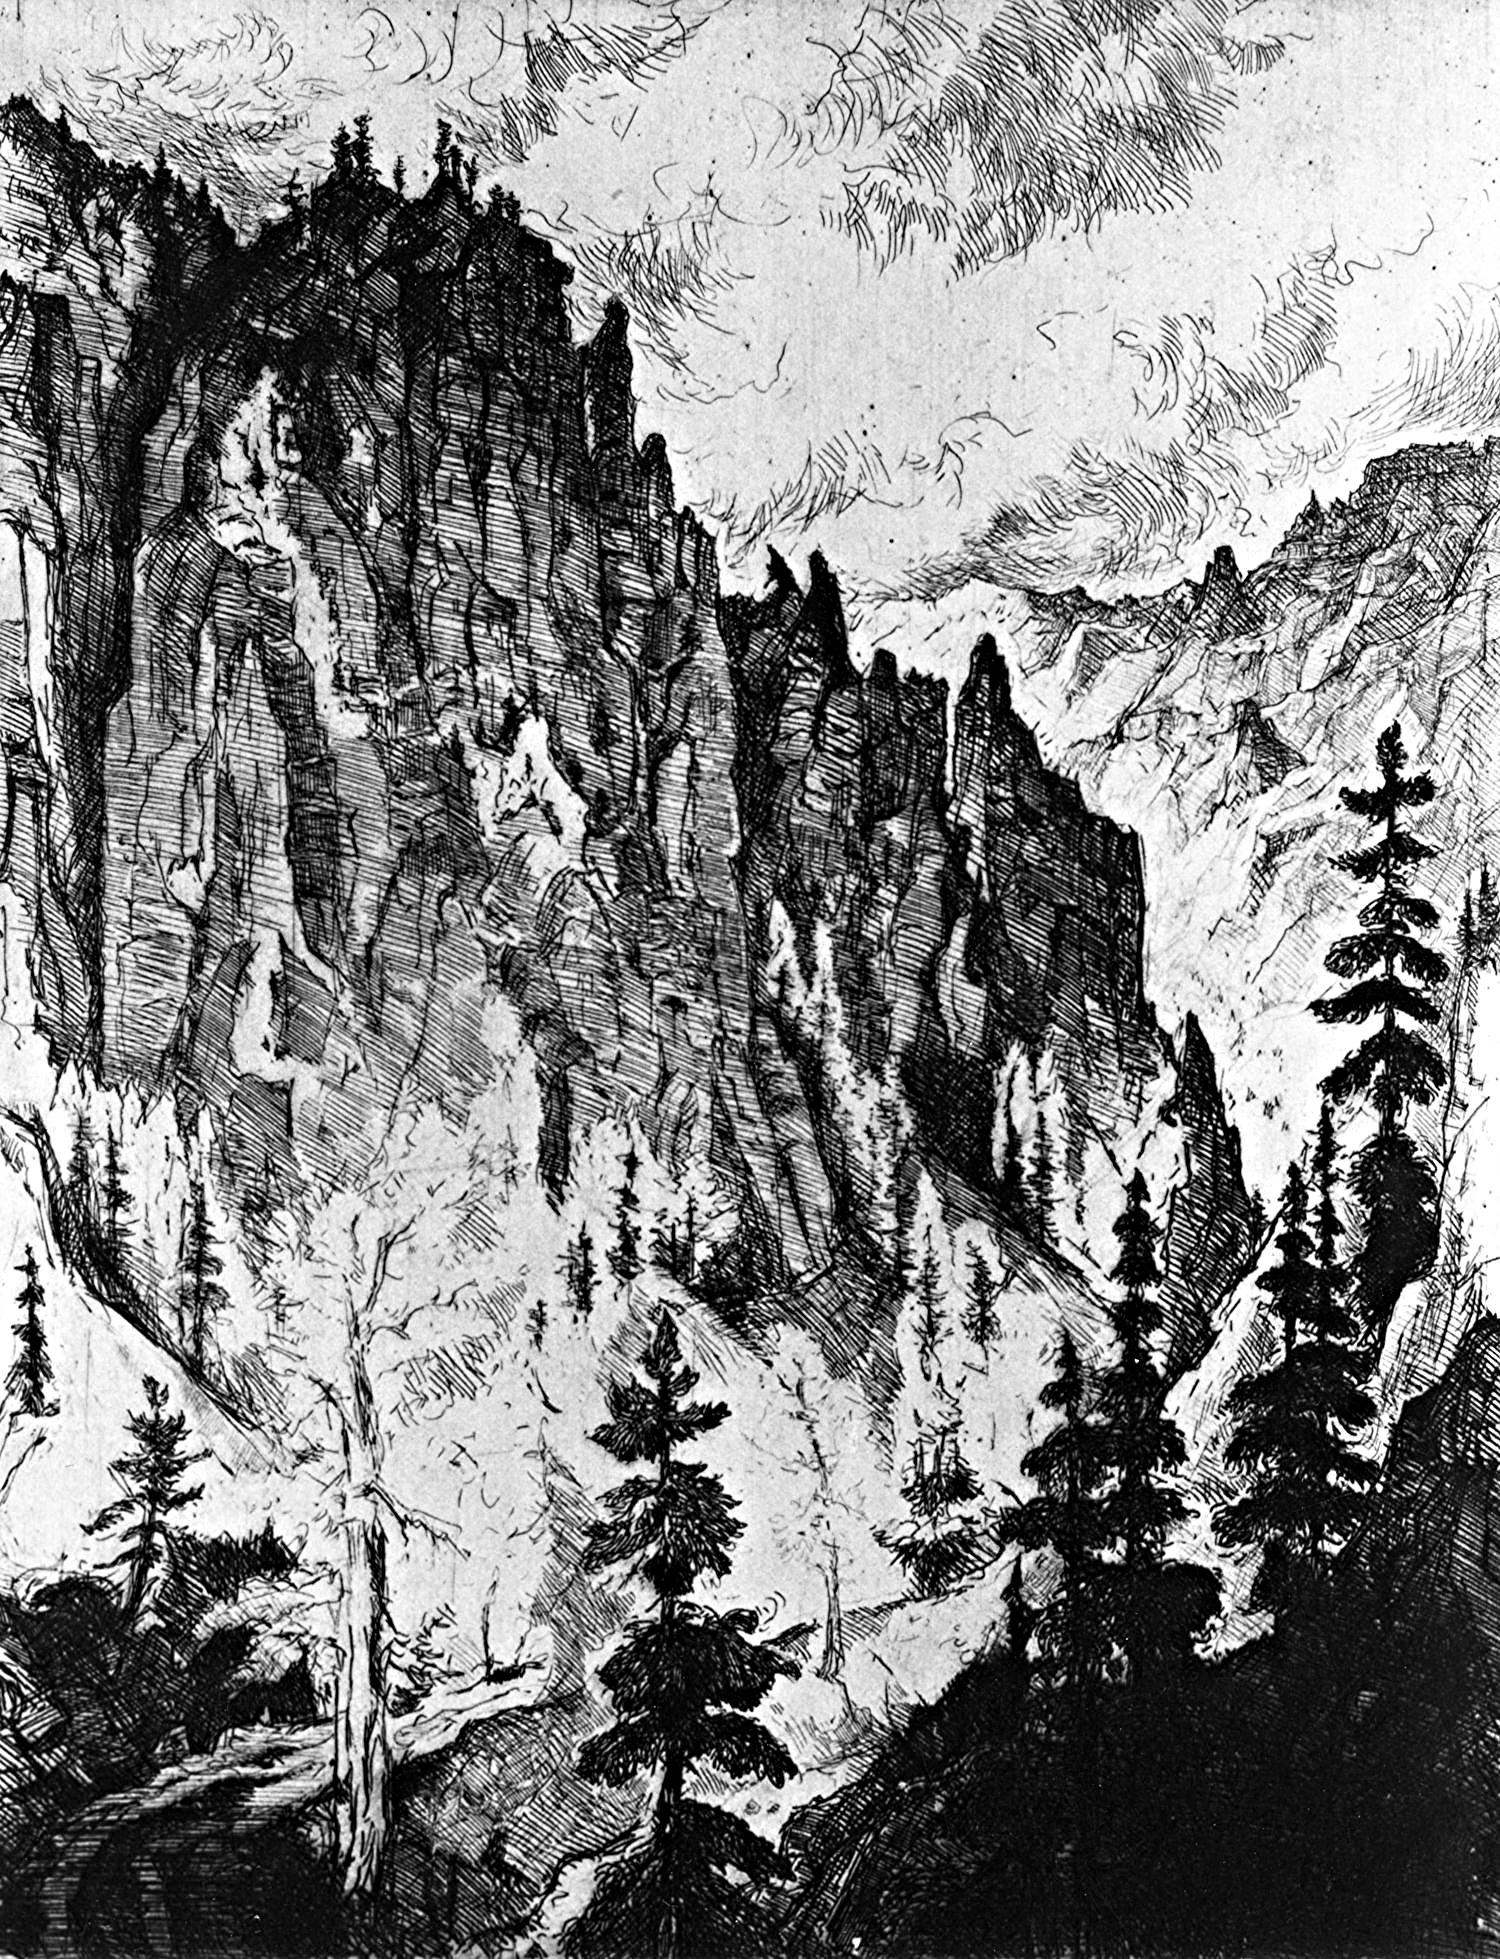 1.4MB_crystal_river_canyon-1.jpg